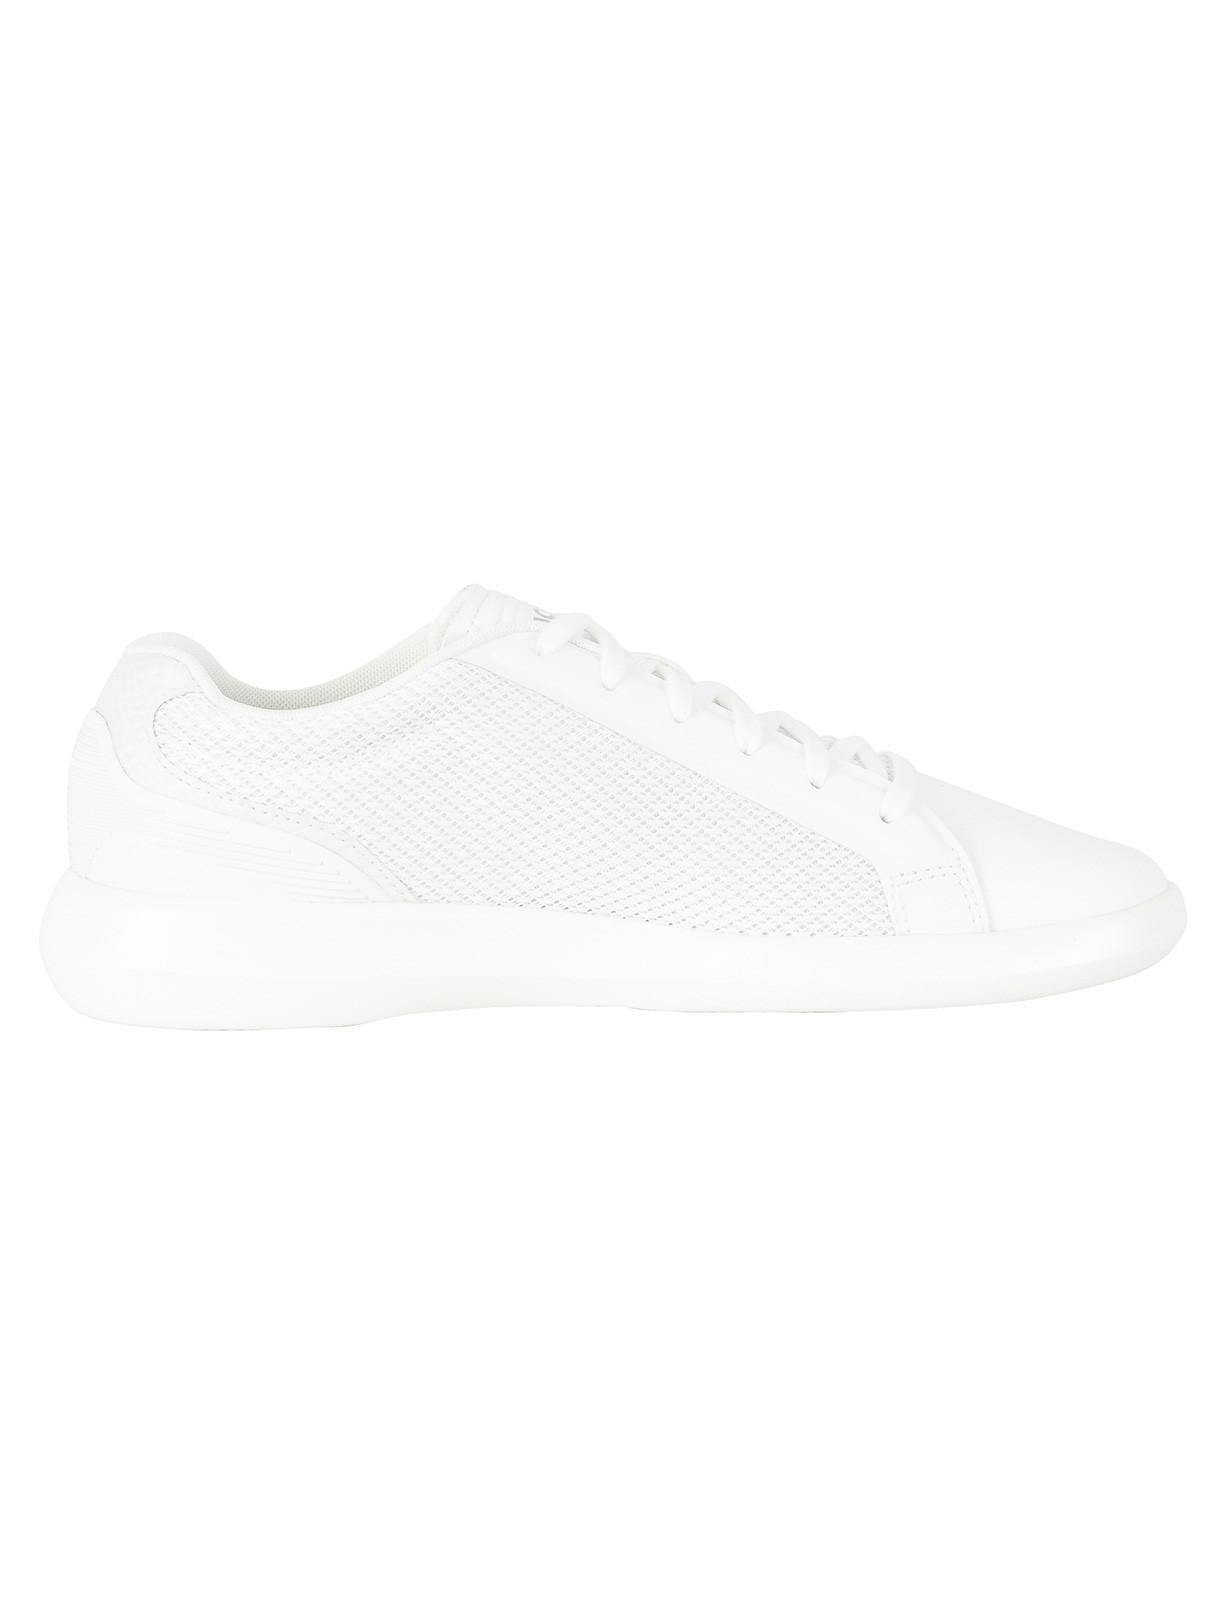 26049cfedcd1bd Lyst - Lacoste White off White Avantor 118 3 Spm Trainers in White